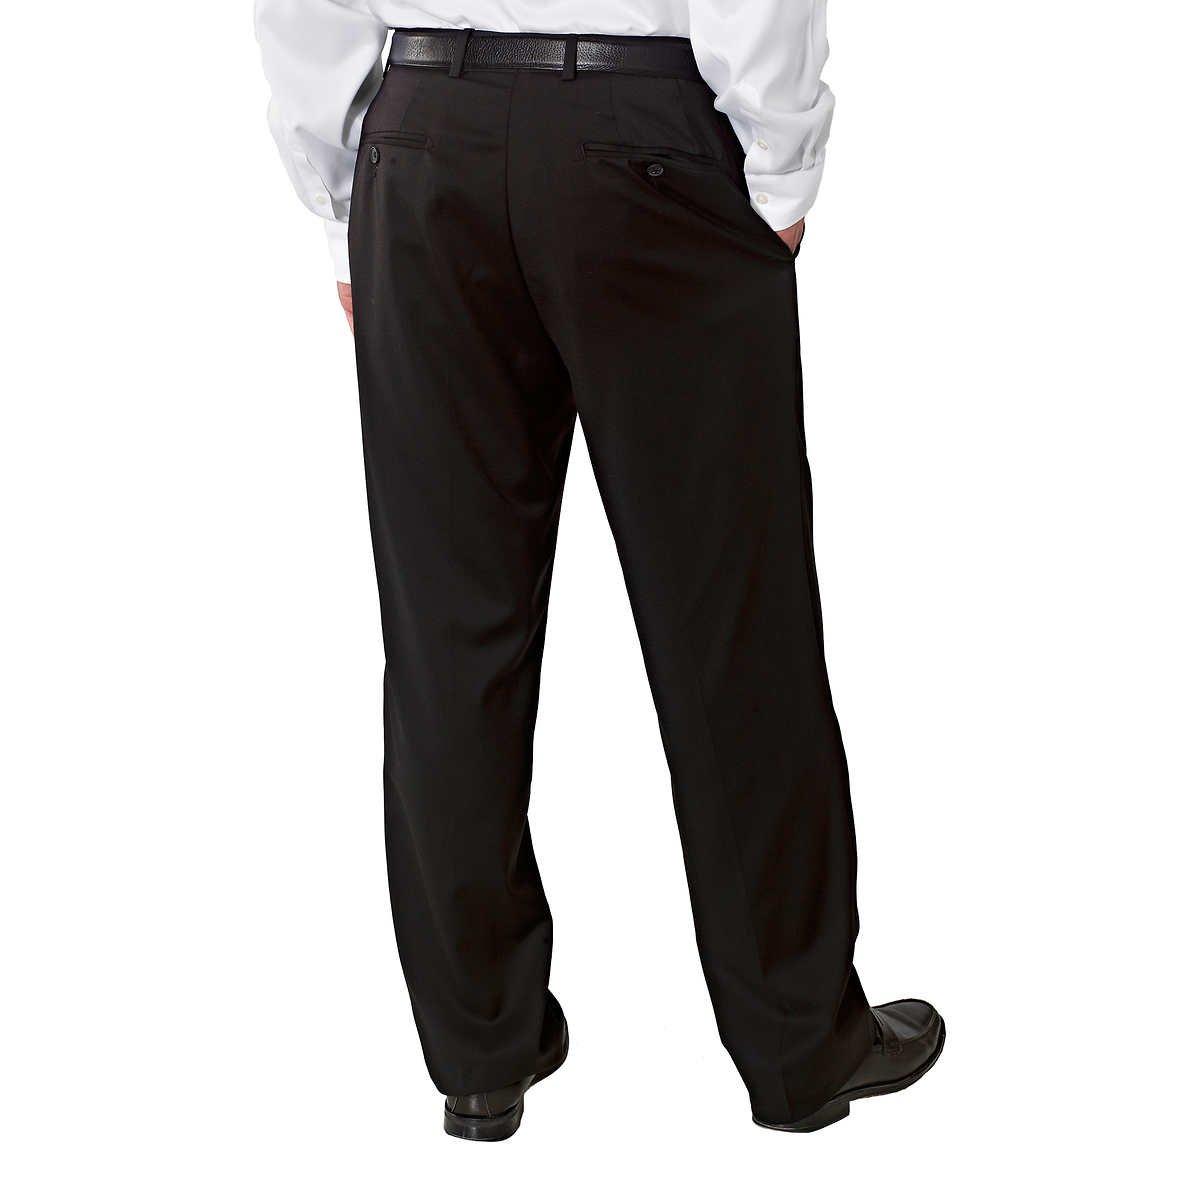 Kirkland Signature Mens Wool Flat Front Dress Pant-Open Bottom Hem (36X32, Black) by Kirkland Signature. (Image #2)